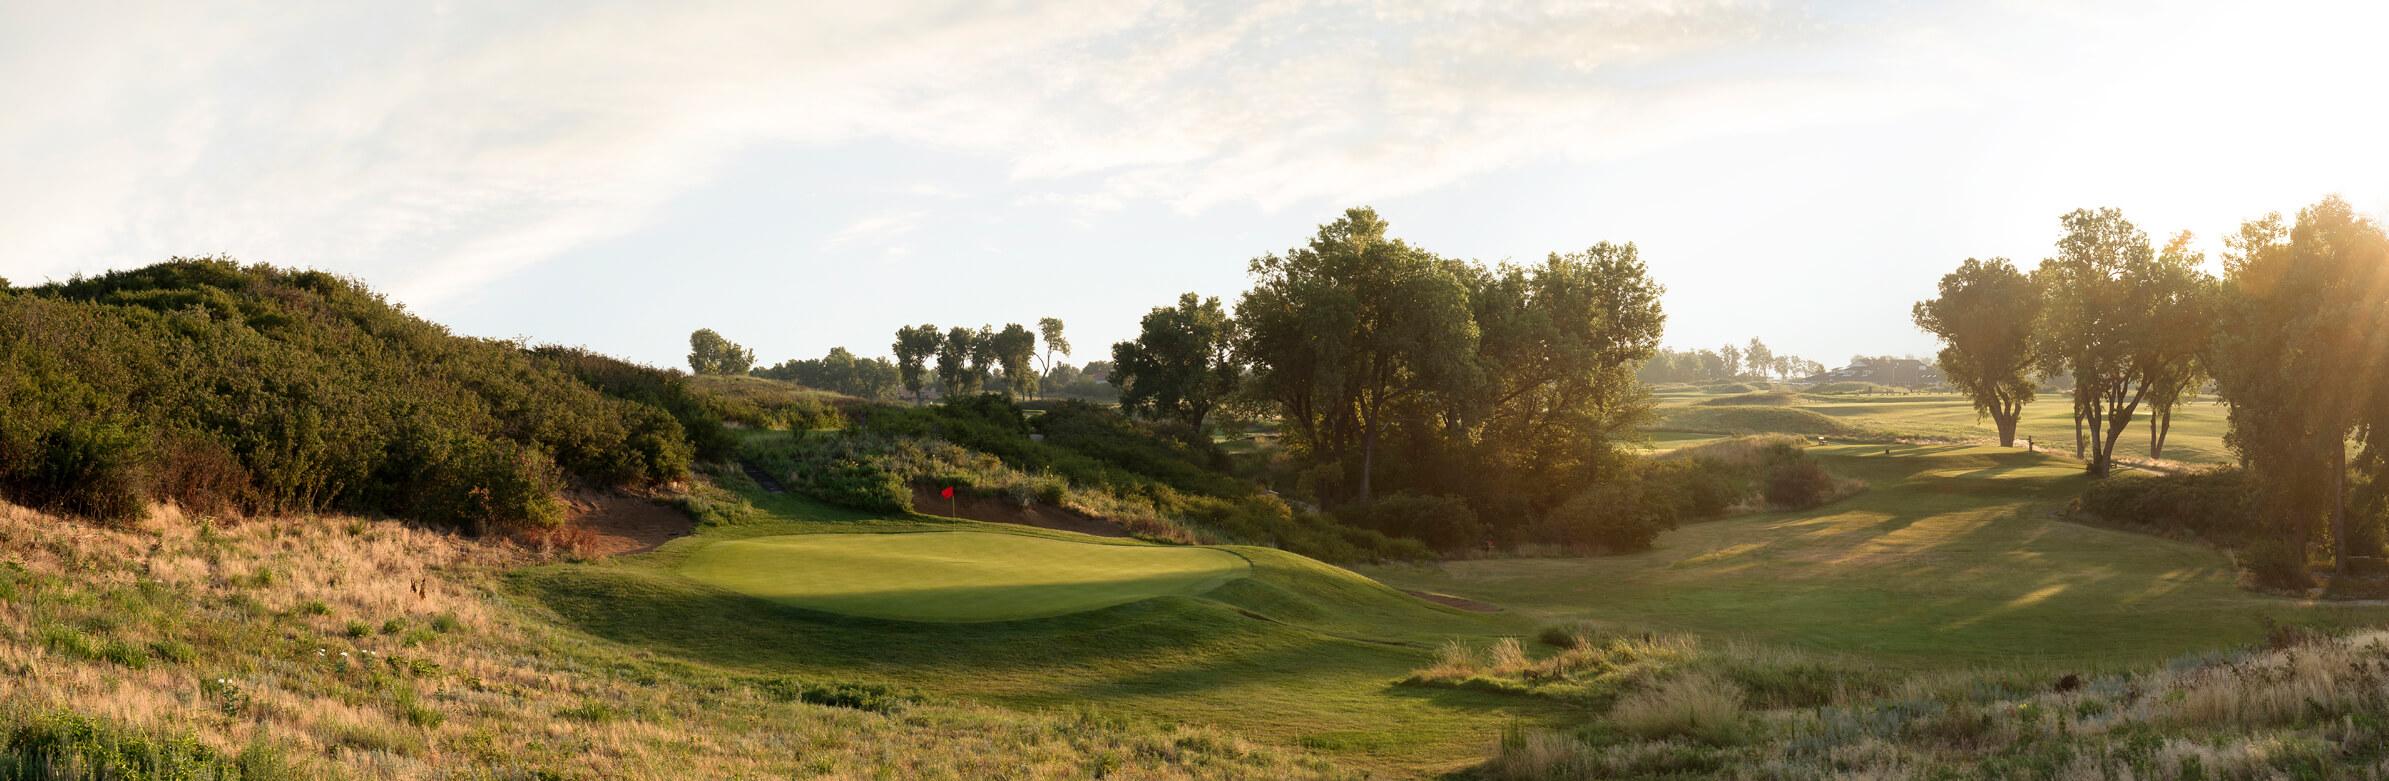 Golf Course Image - Prairie Dunes Country Club No. 2